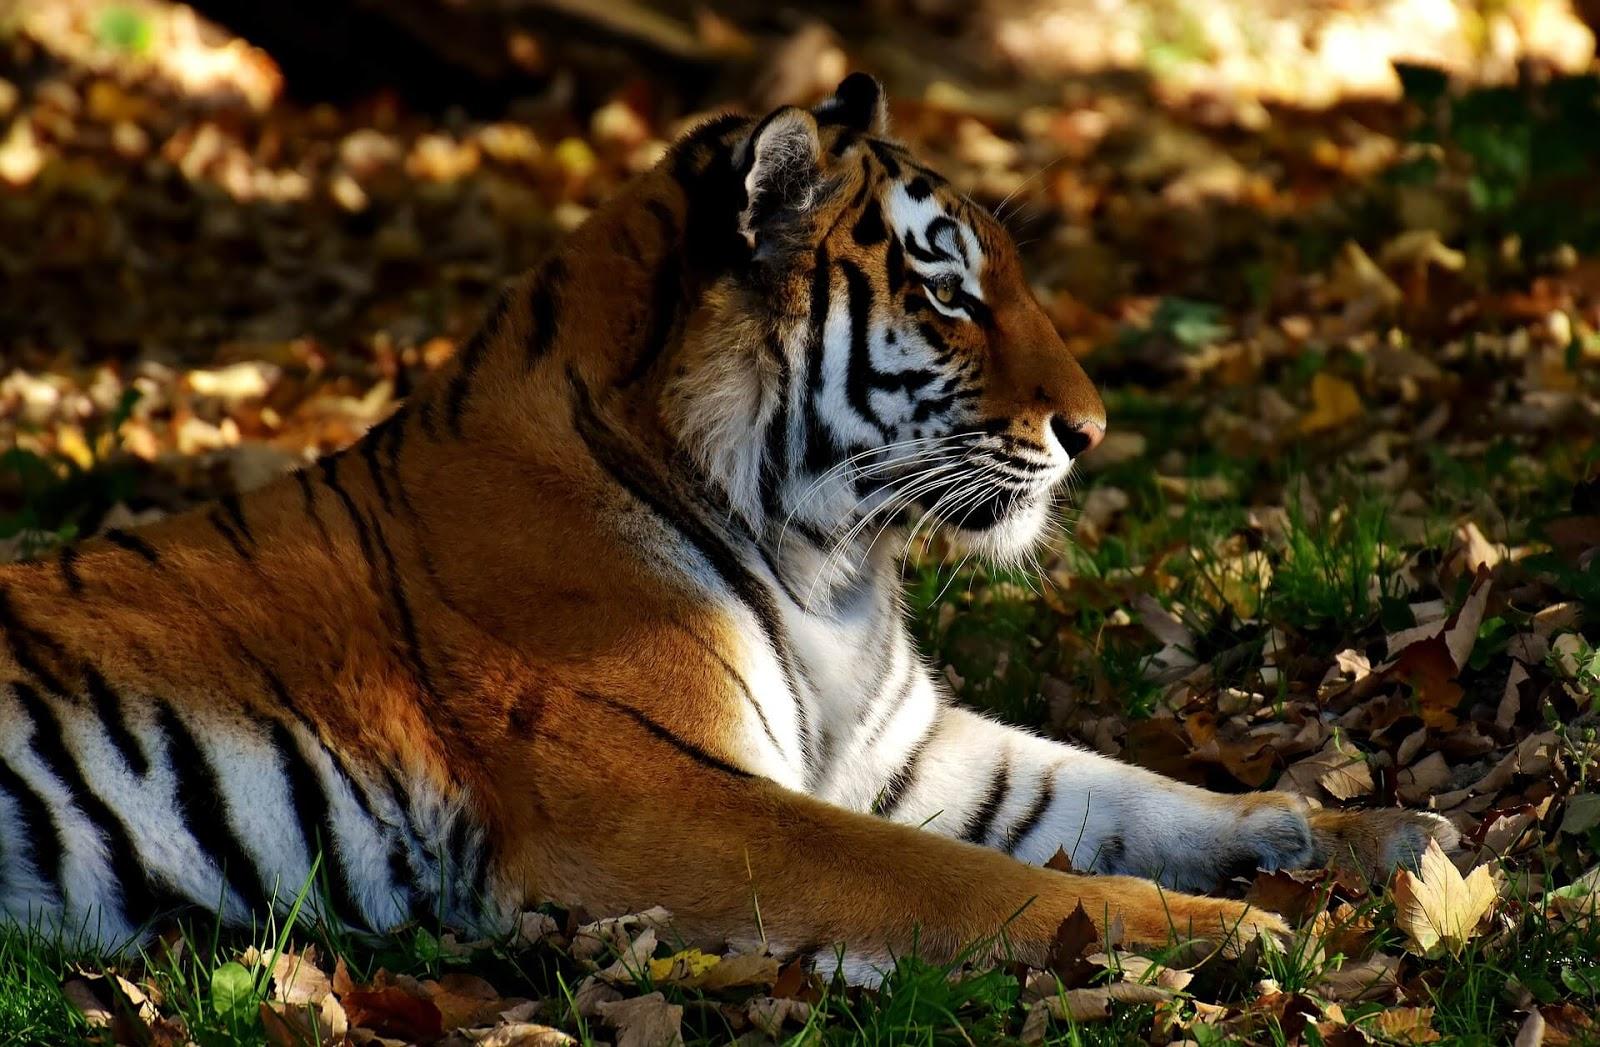 tiger colour in picture